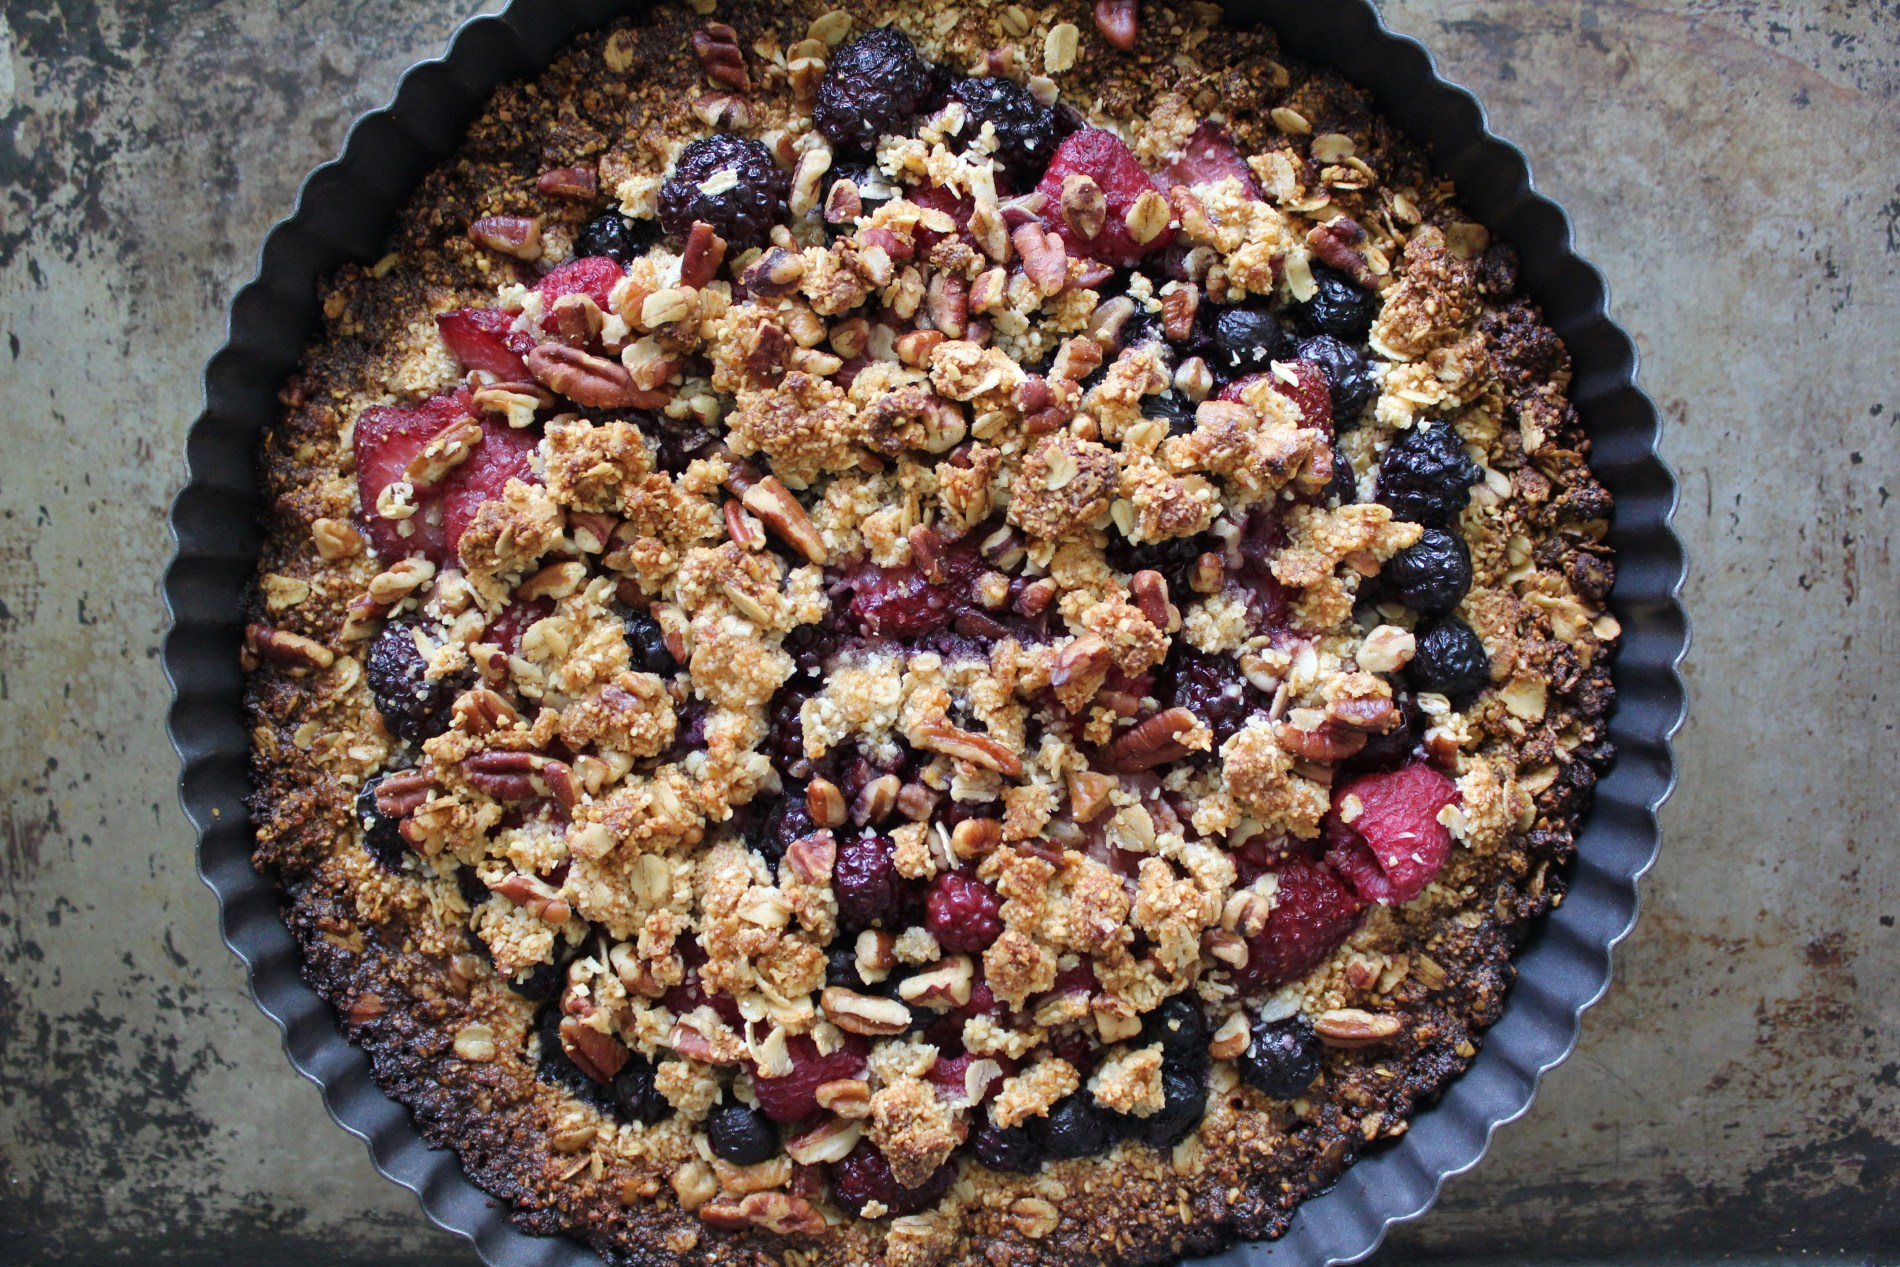 Reversible Crumbleberry Tart